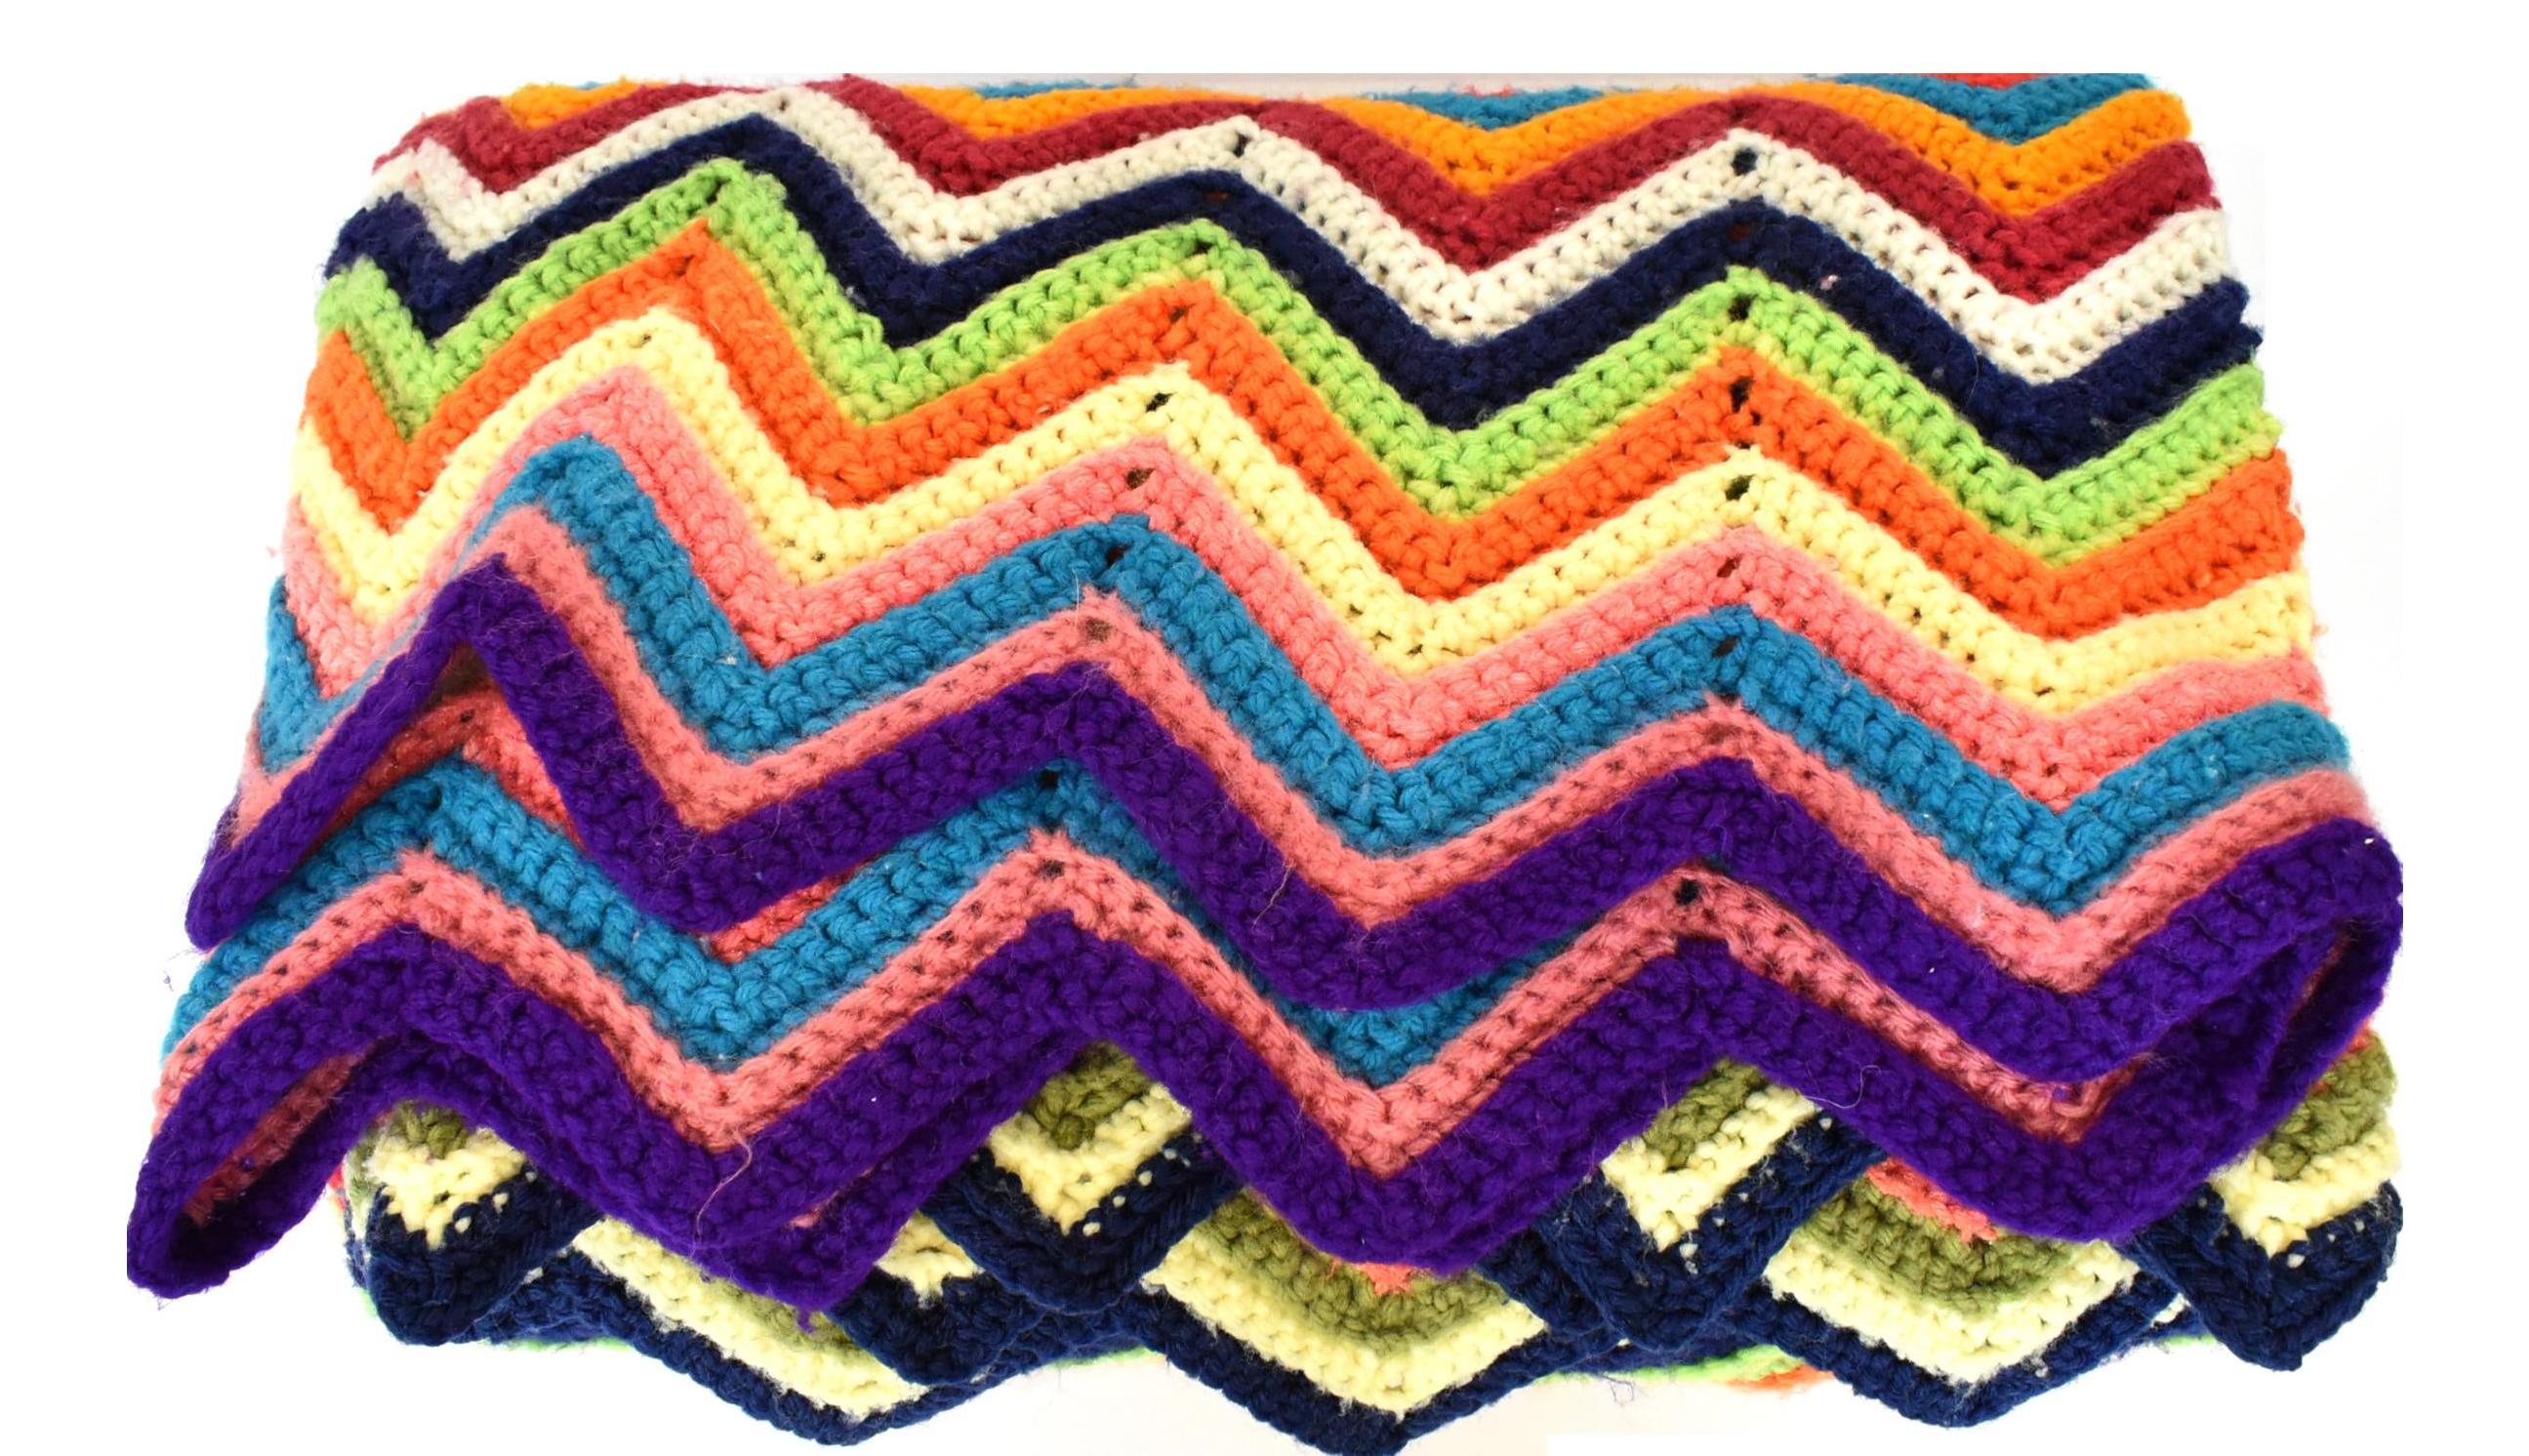 Crotchet Multi-colored Throw Blanket Vintage